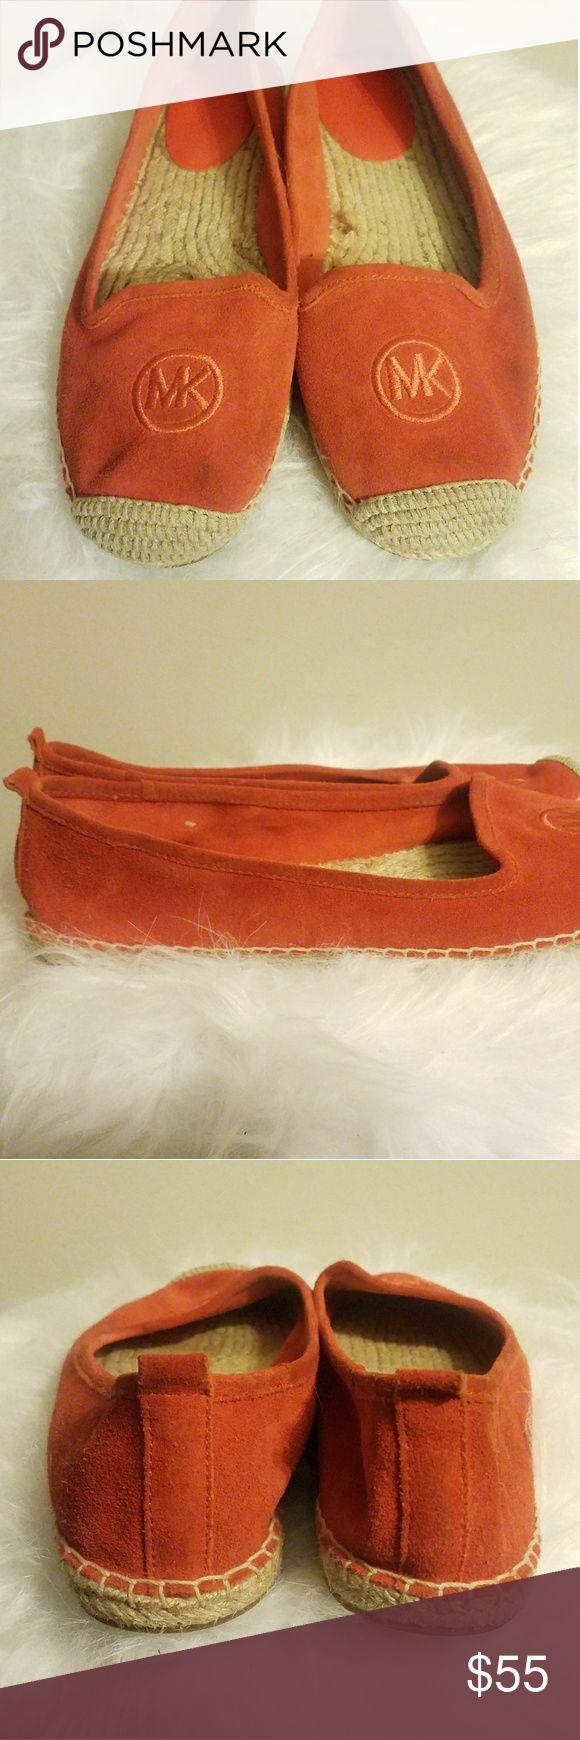 Michael Kors Orange Espadrille Shoes 9 Very comfortable with suede material. MICHAEL Michael Kors Shoes Espadrilles